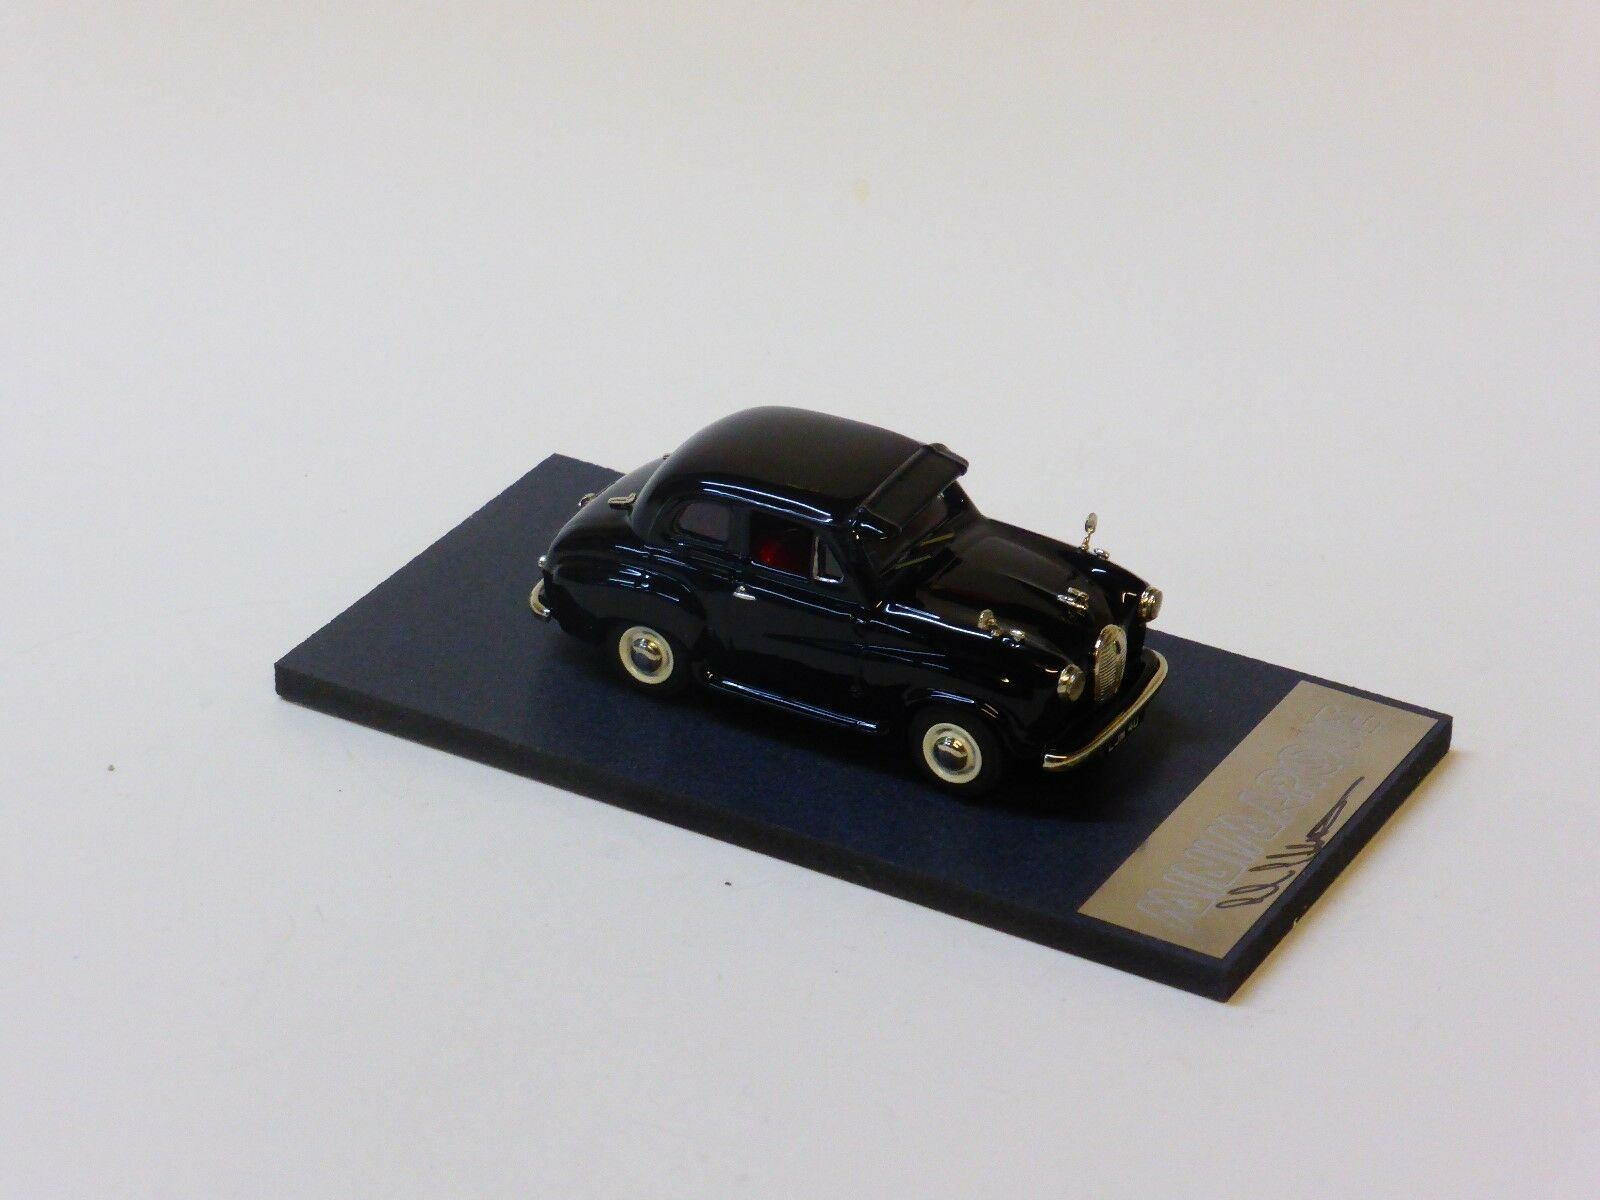 GRB117 Minimarque Modellls, Austin A30 1 43 Ltd ed Modellll by Illustra Modellls